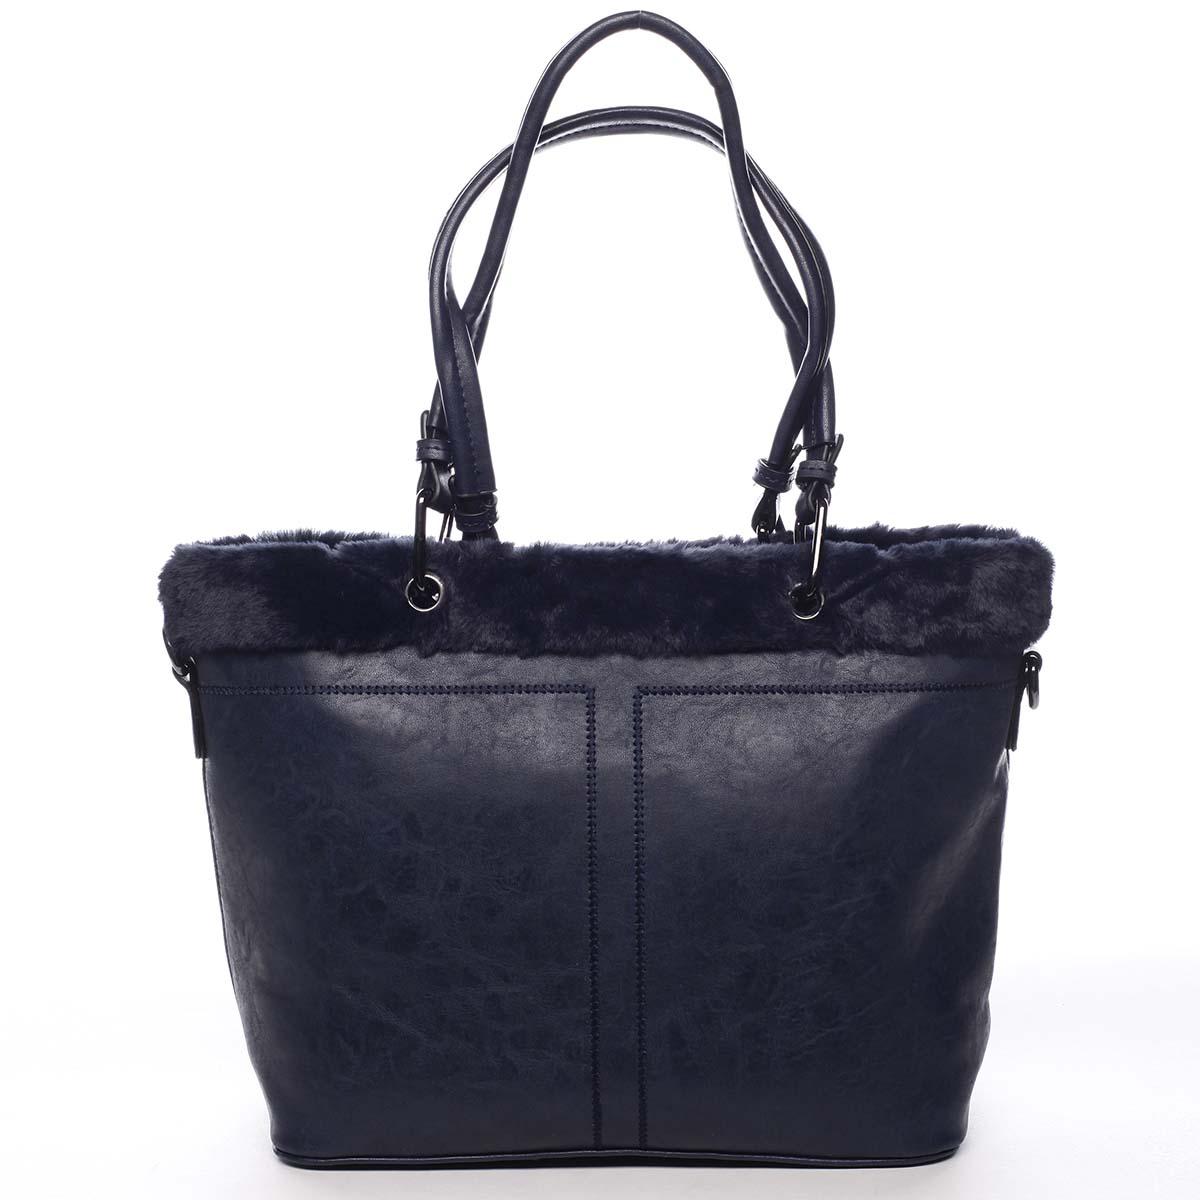 Dámska kabelka cez rameno tmavo modrá - Maria C Lyra modrá